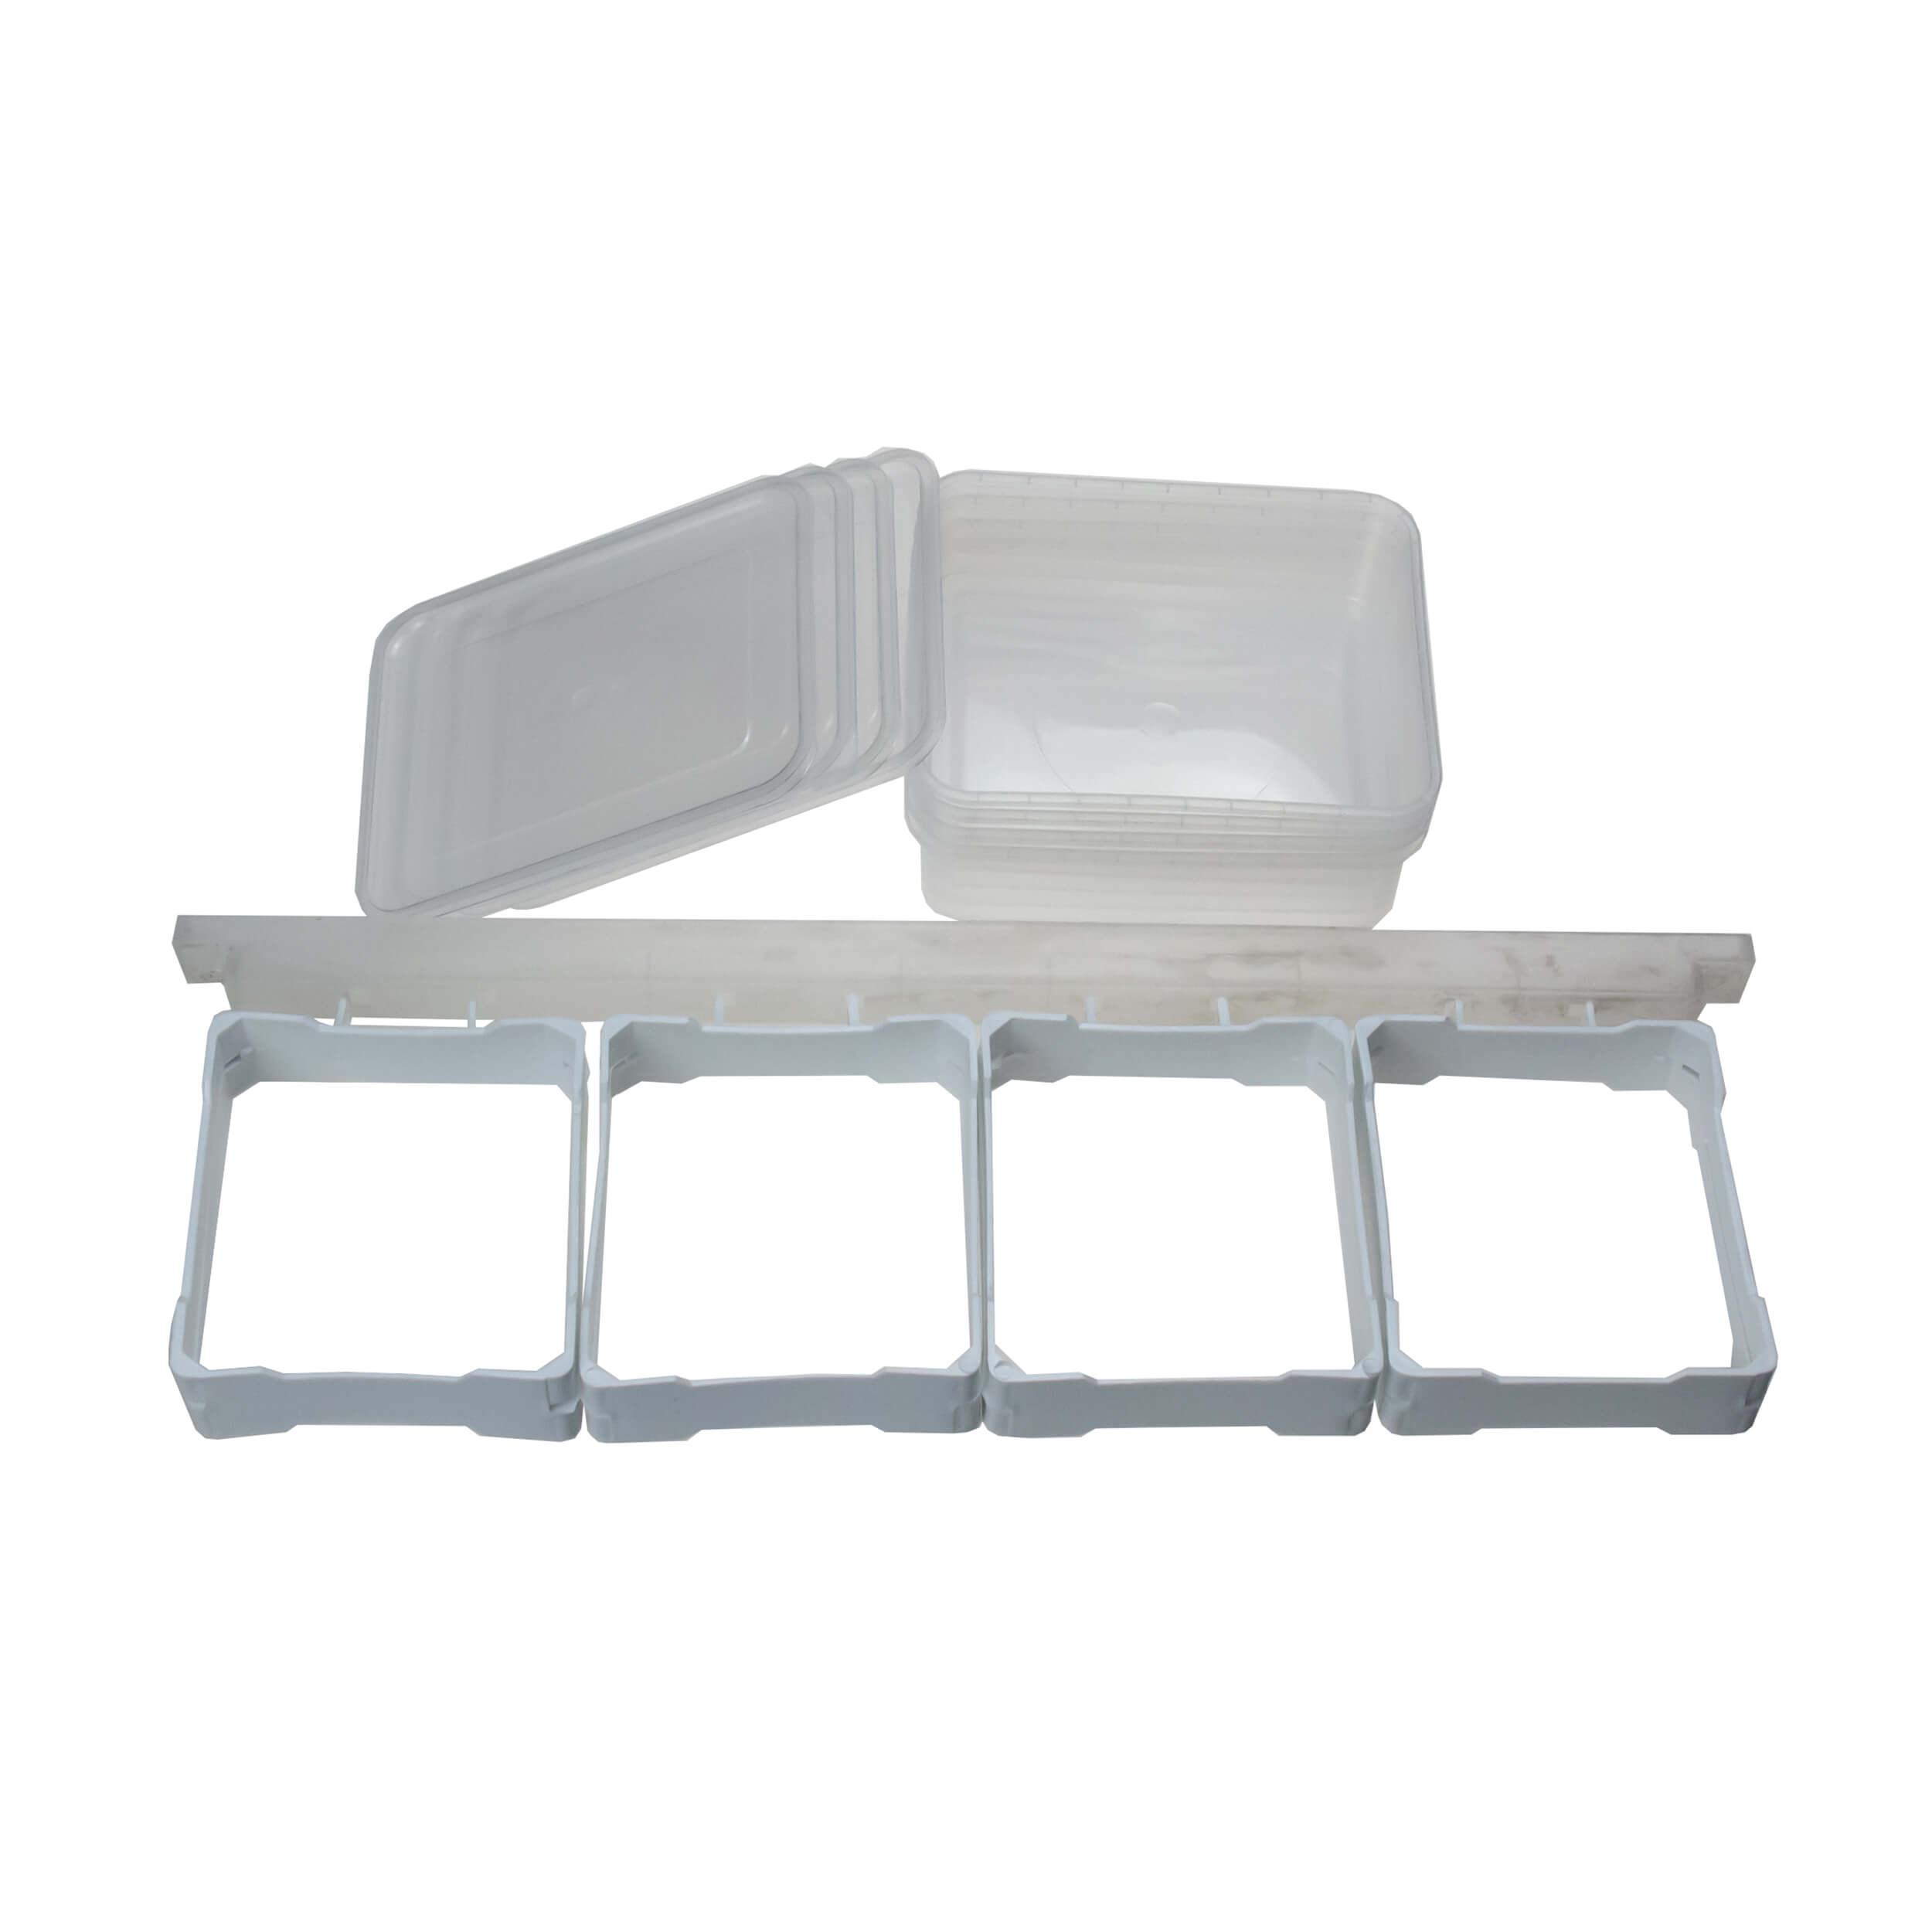 "Рамки для сотового меда с контейнерами ""BeeHoney-4"" (комплект на 4 мини рамки) фото"